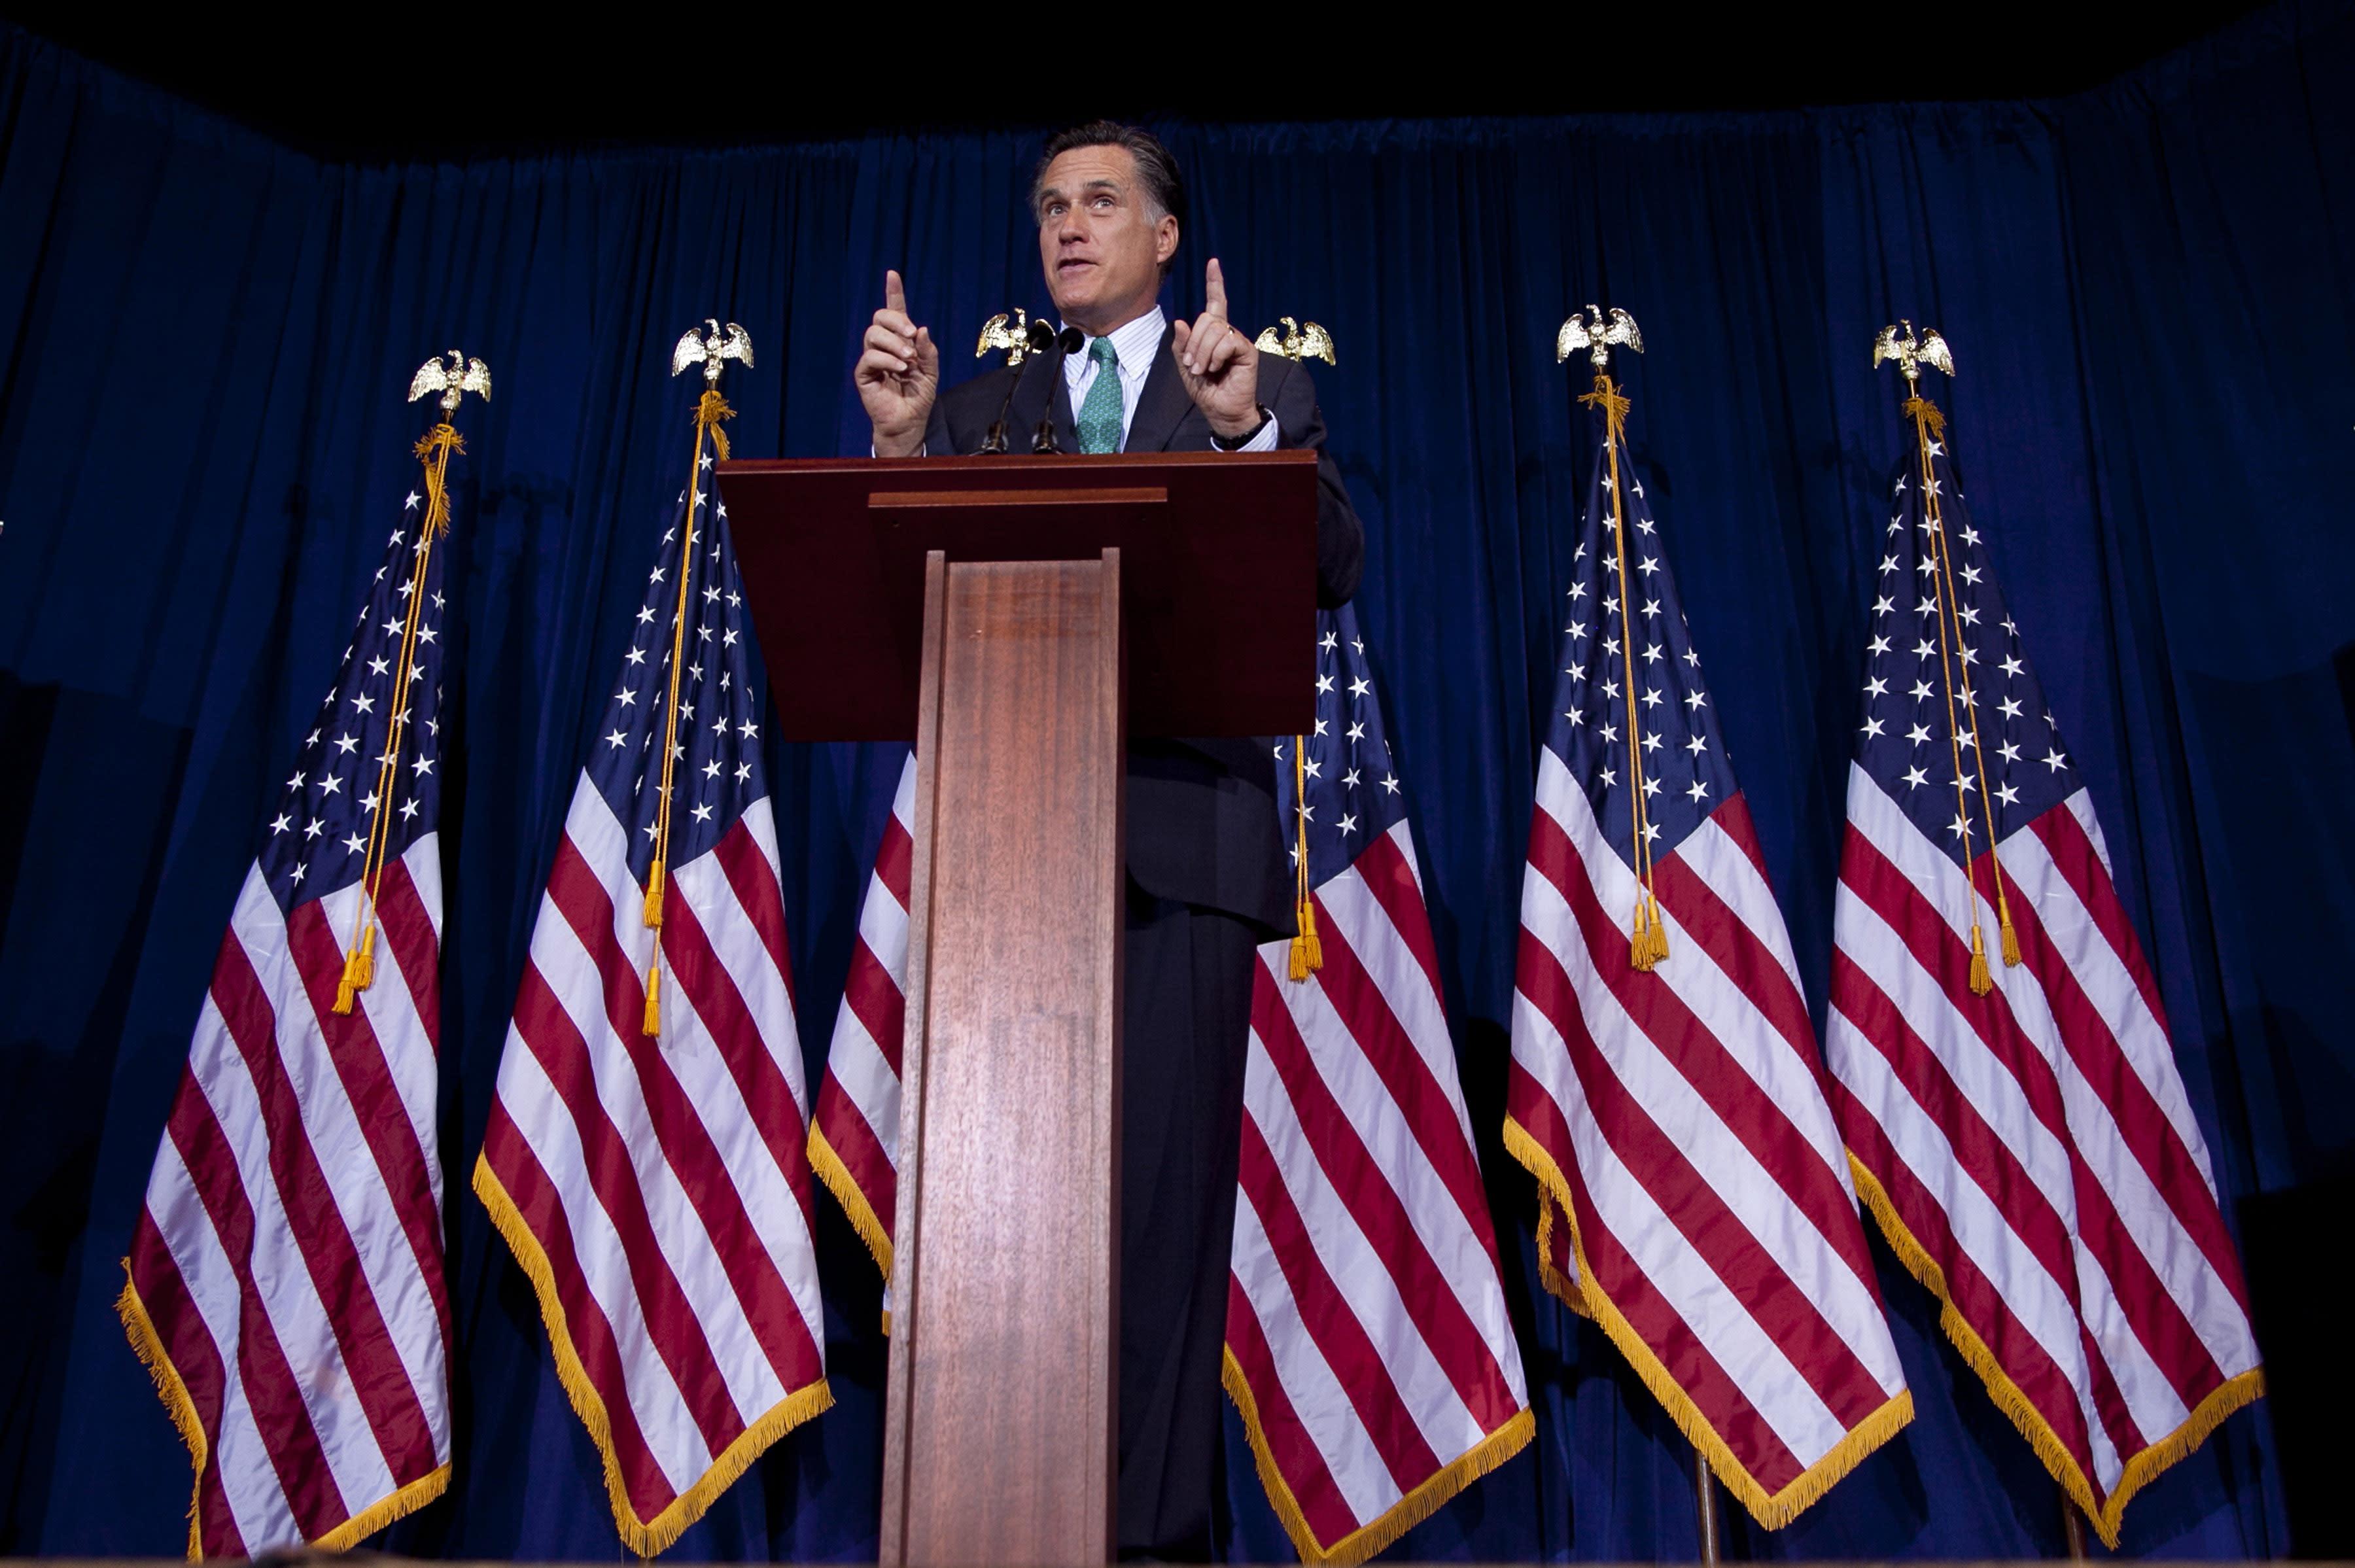 Republican presidential candidate, former Massachusetts Gov. Mitt Romney speaks at the University of Chicago, Monday, March 19, 2012, in Chicago. (AP Photo/Steven Senne)